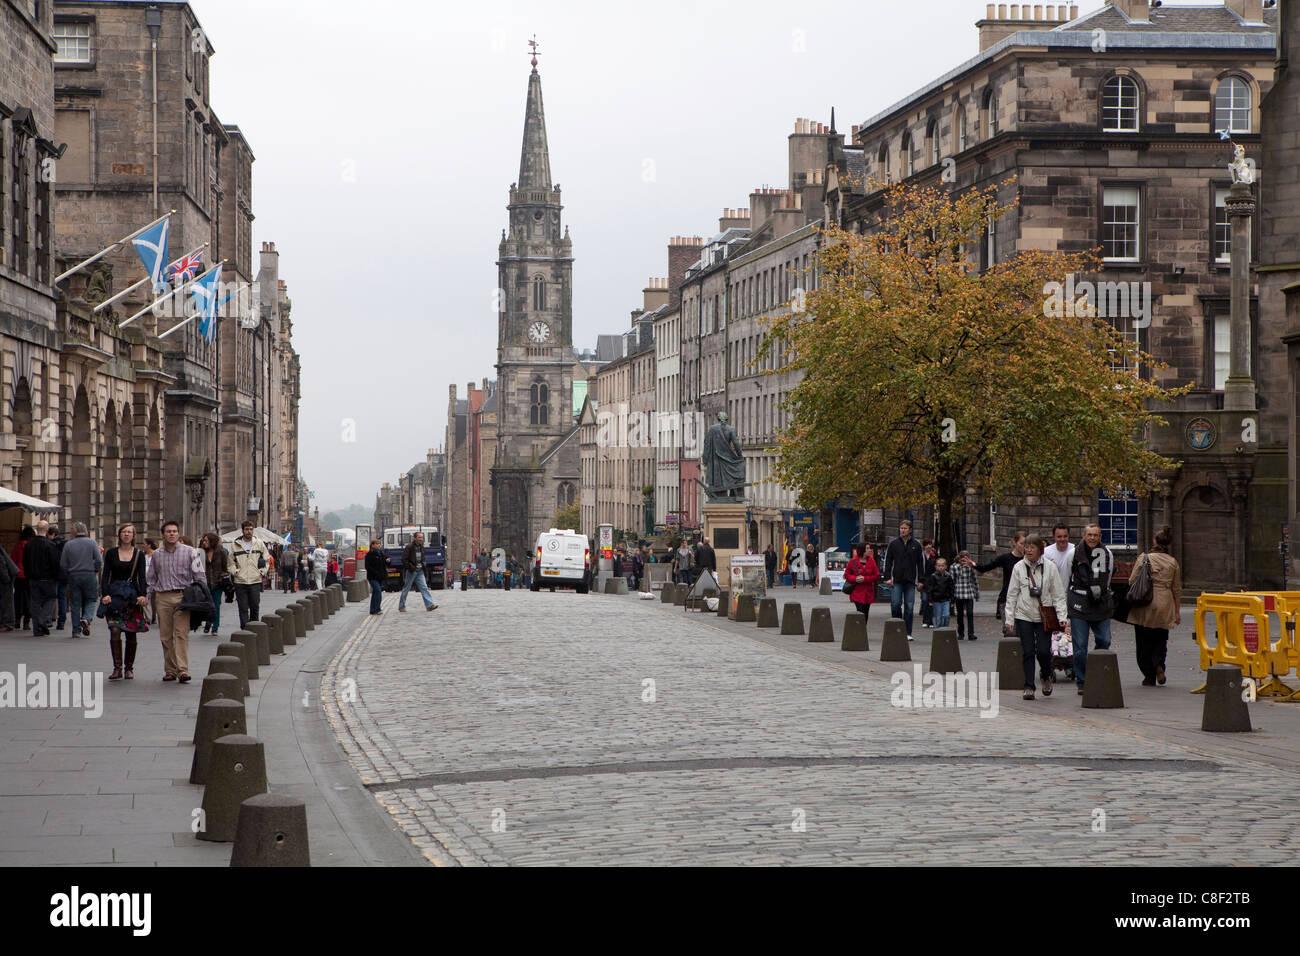 Royal Mile, The Old Town, Edinburgh, Scotland, United Kingdom - Stock Image